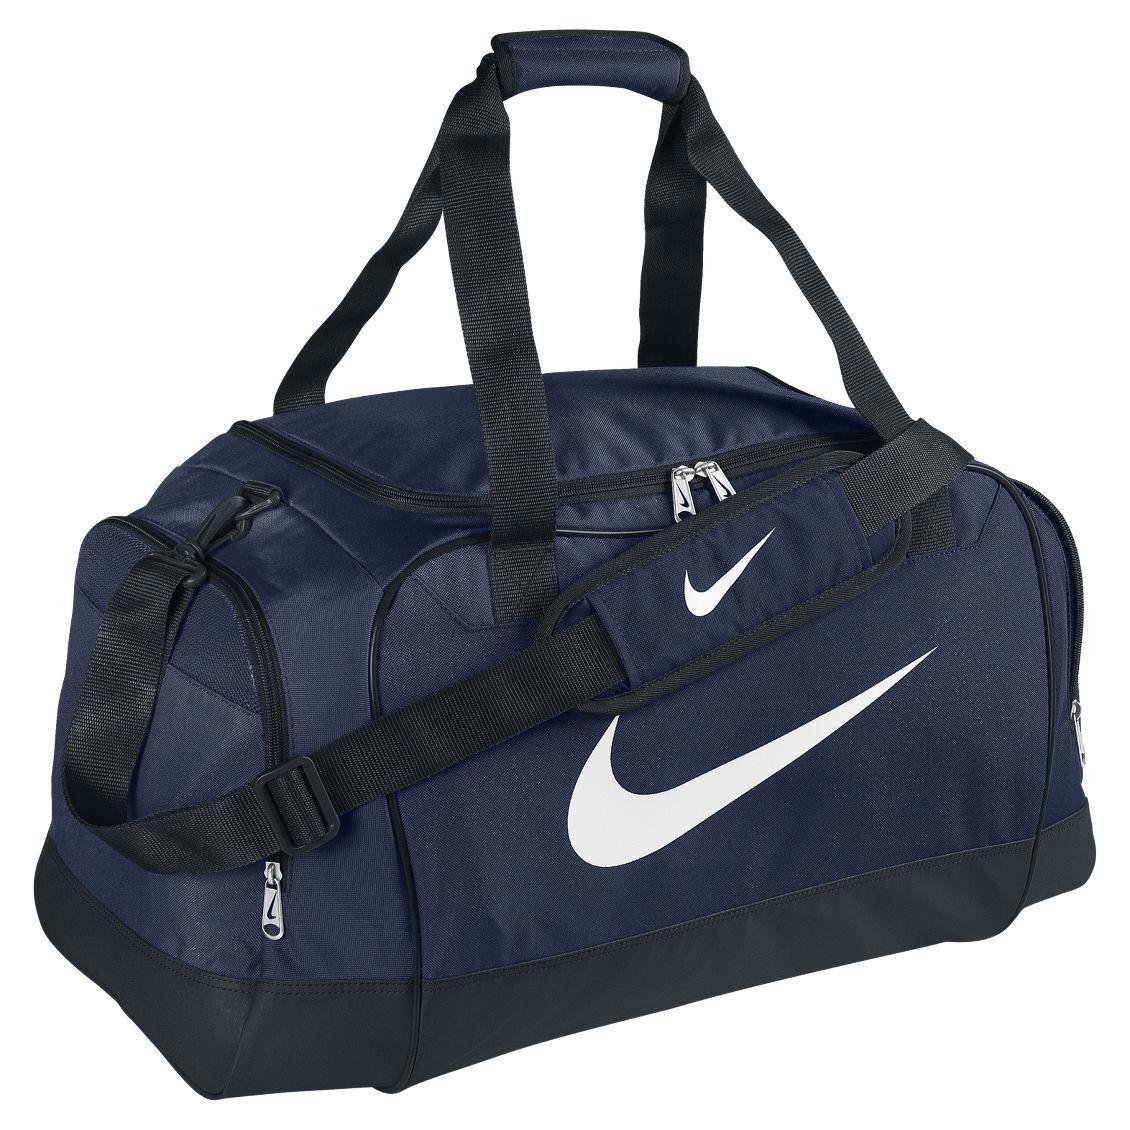 d6e14dc85ee94 Nike Bag Club Team Medium Duffel Personal Navy bag Soccer Football Gym